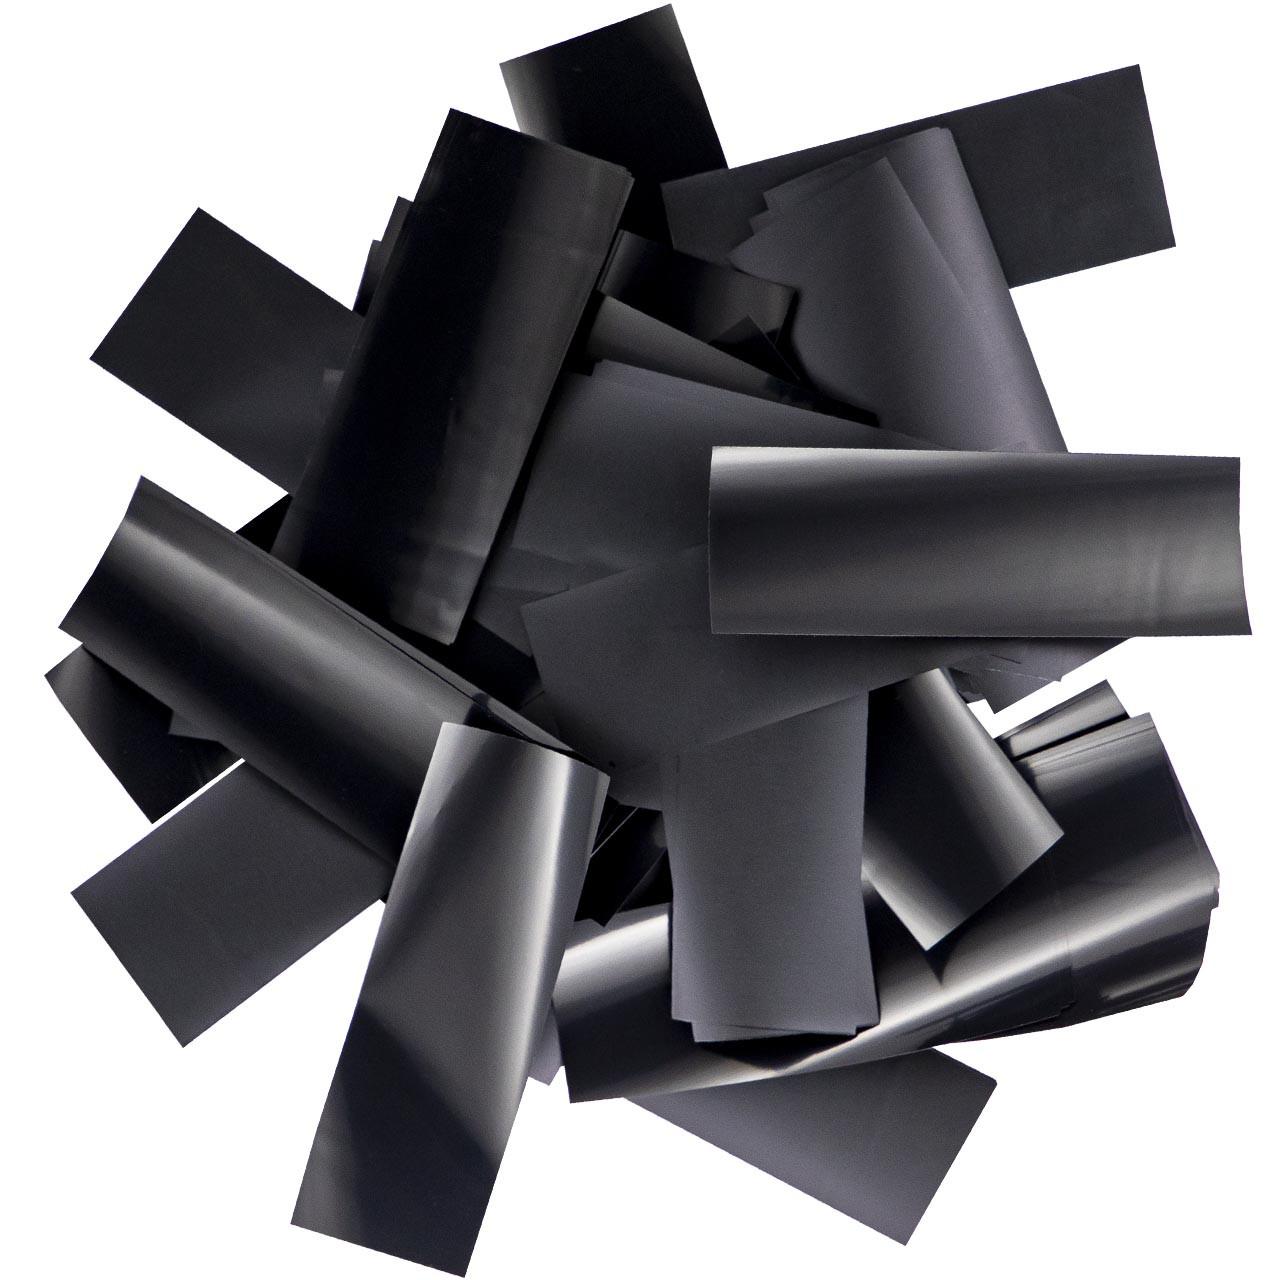 Конфетти-Метафан Черный Премиум 2.5х6 (пленочный) 1кг